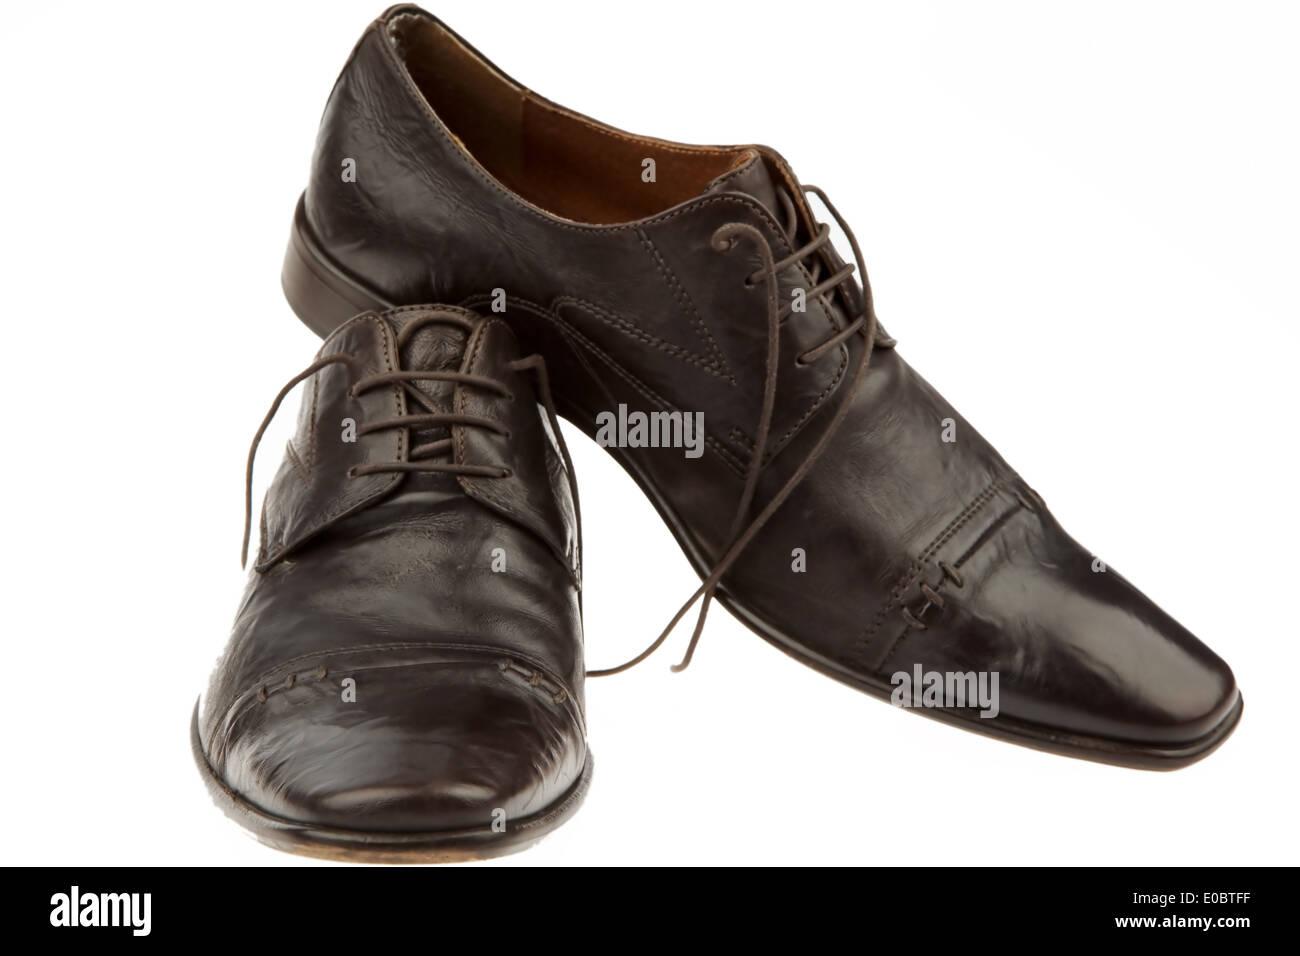 Man's shoes man's shoes men man clothes commercial clothes shoes business clothes business Businesspeople business look commerci - Stock Image